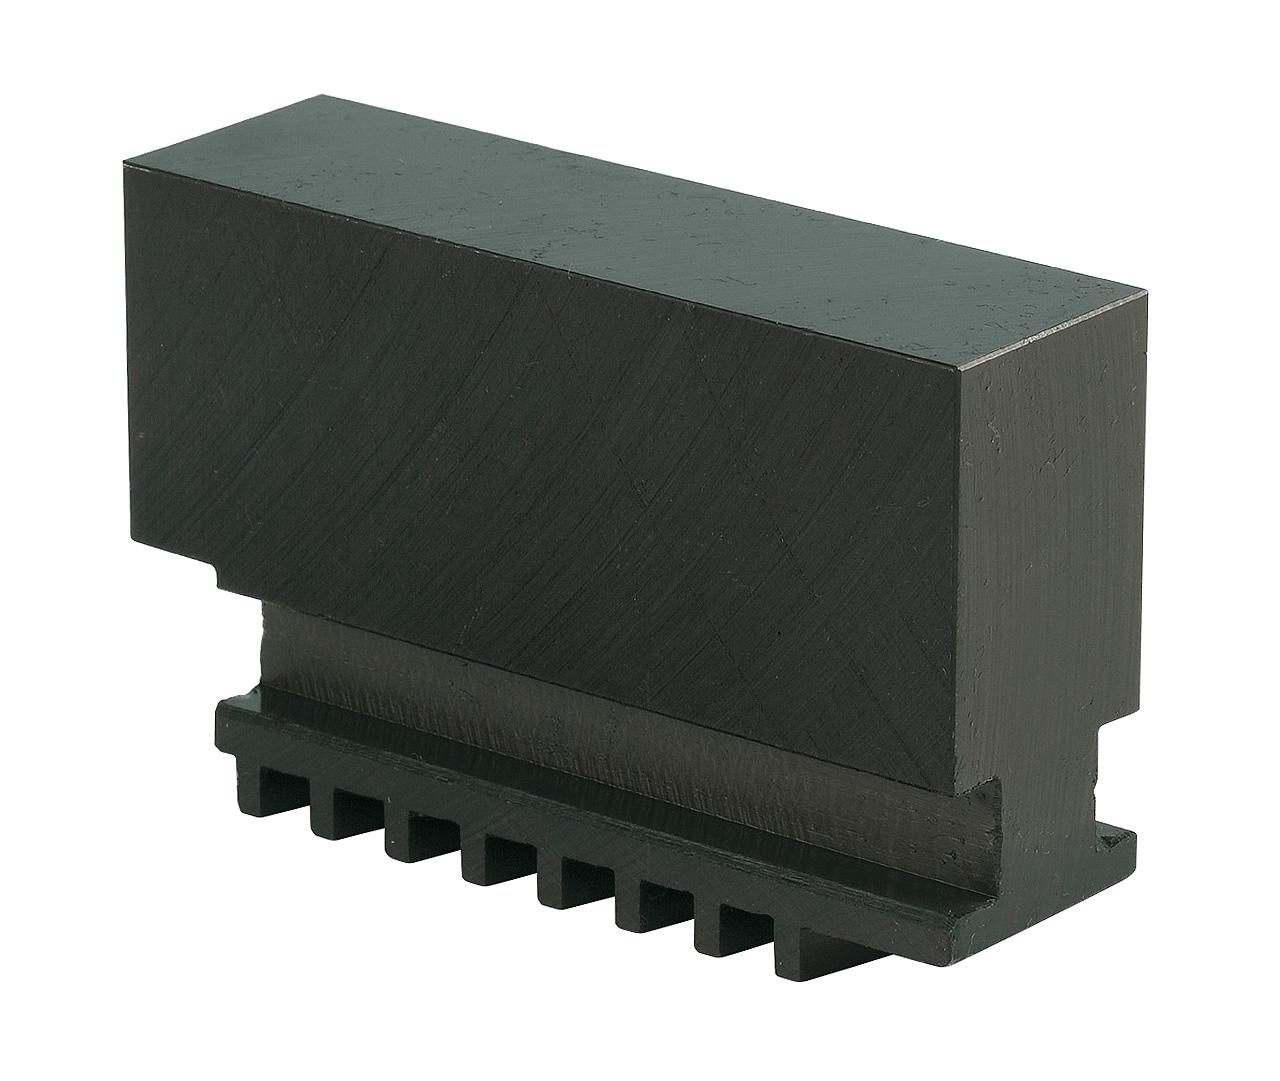 Szczęki jednolite miękkie - komplet SJ-PS4-125 BERNARDO